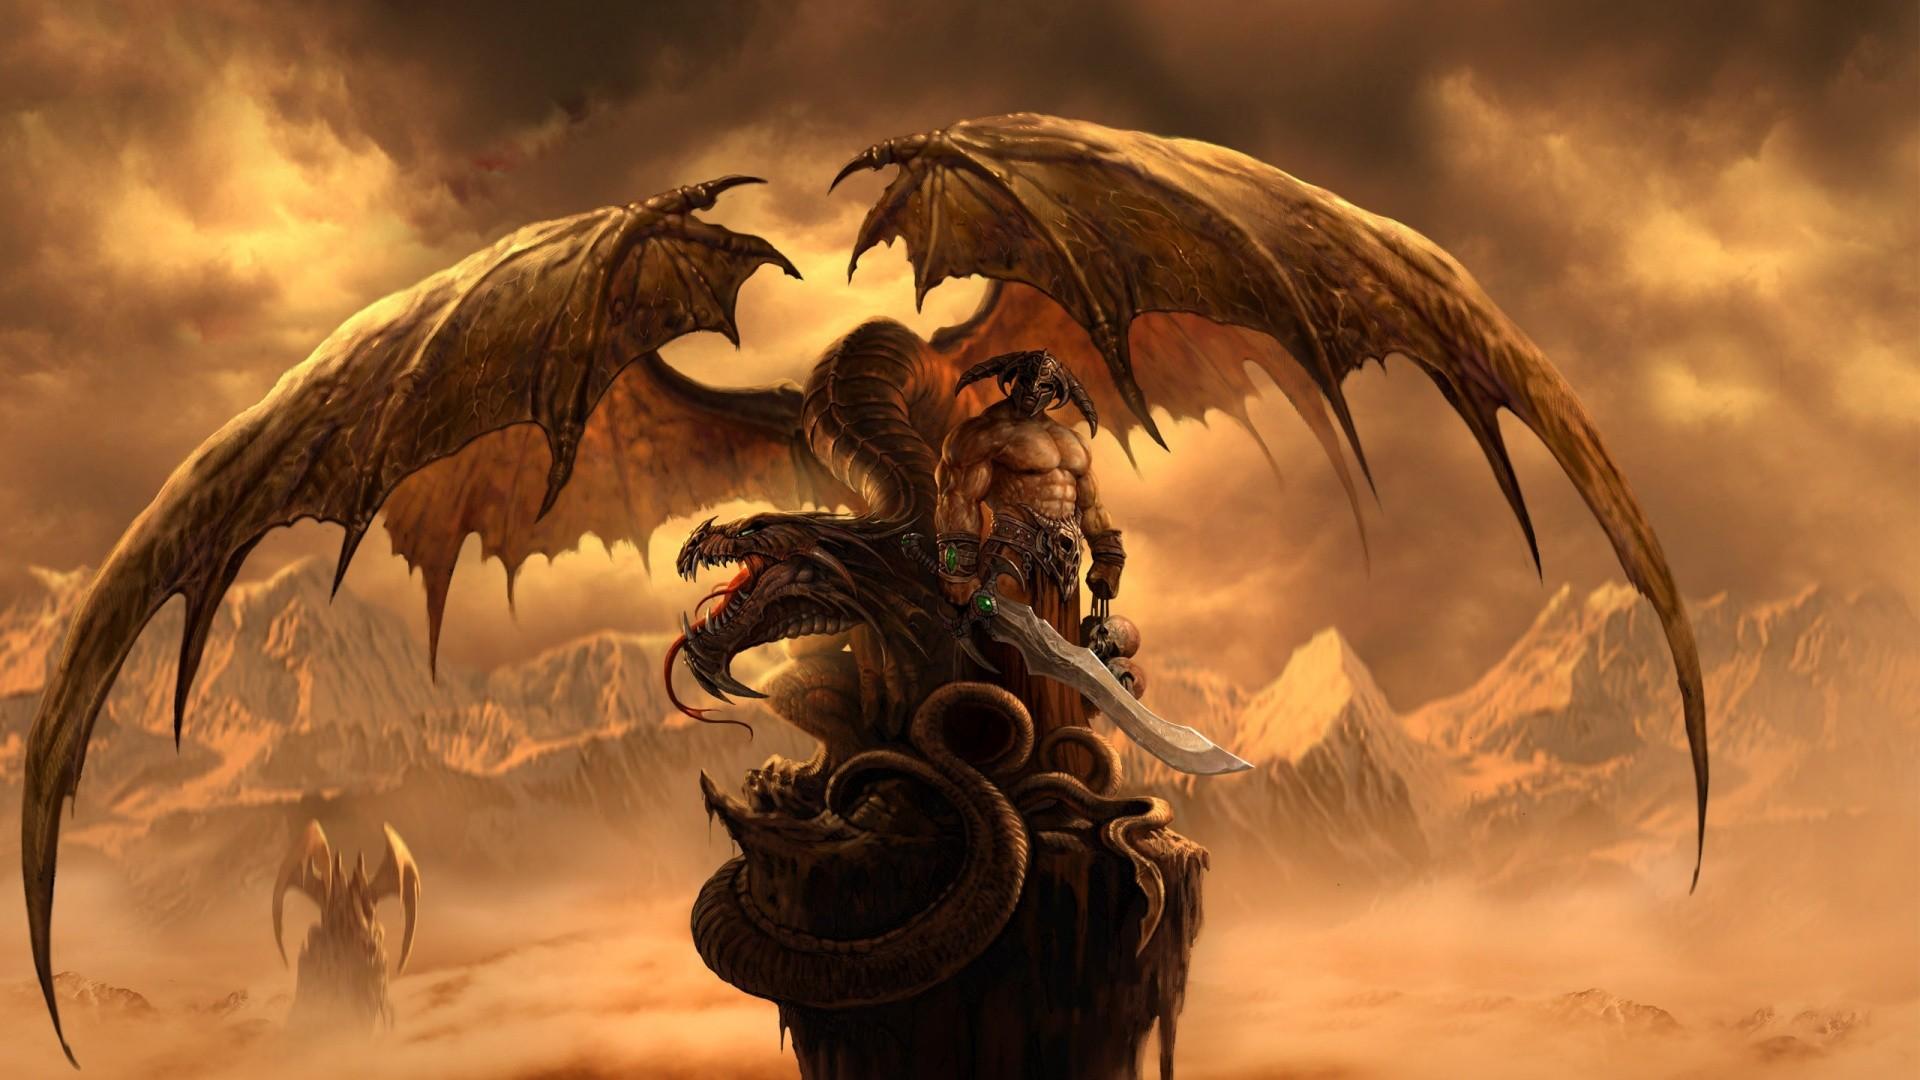 Dark Dragon Wallpaper Widescreen